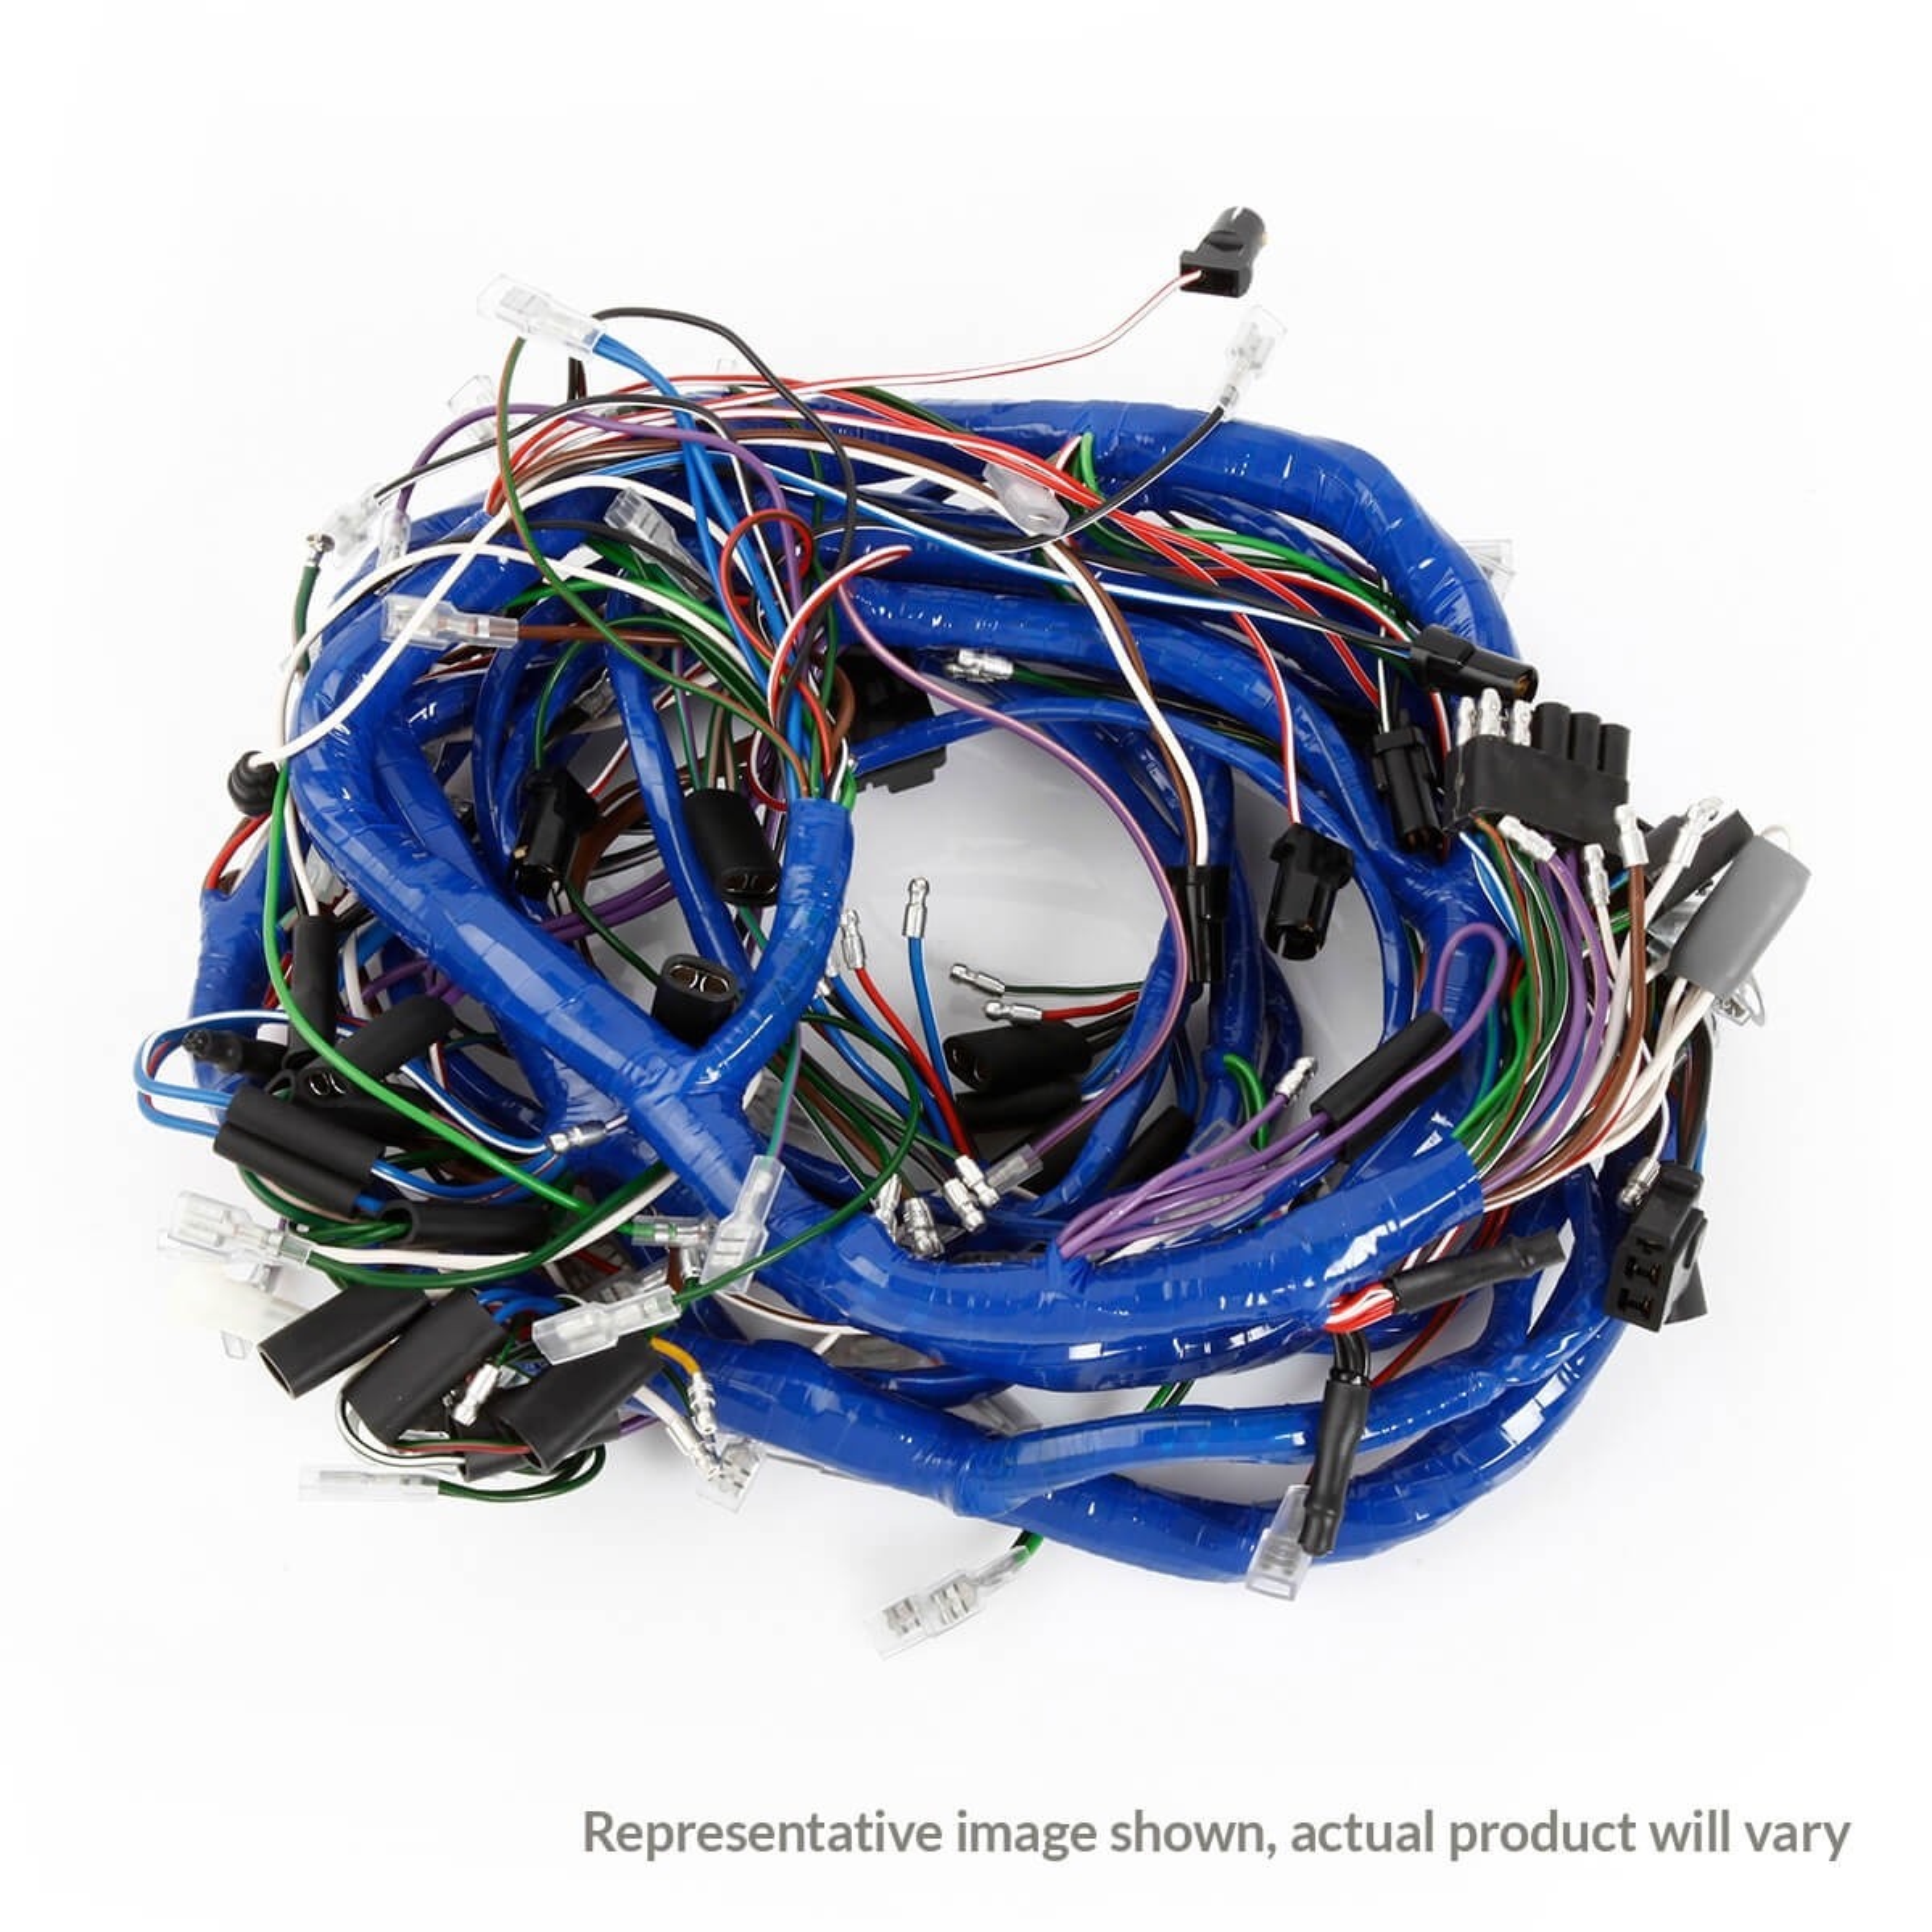 [QMVU_8575]  357-570 Body Wiring Harness | Moss Motors | Triumph Wiring Harness Repair Tape |  | Moss Motors